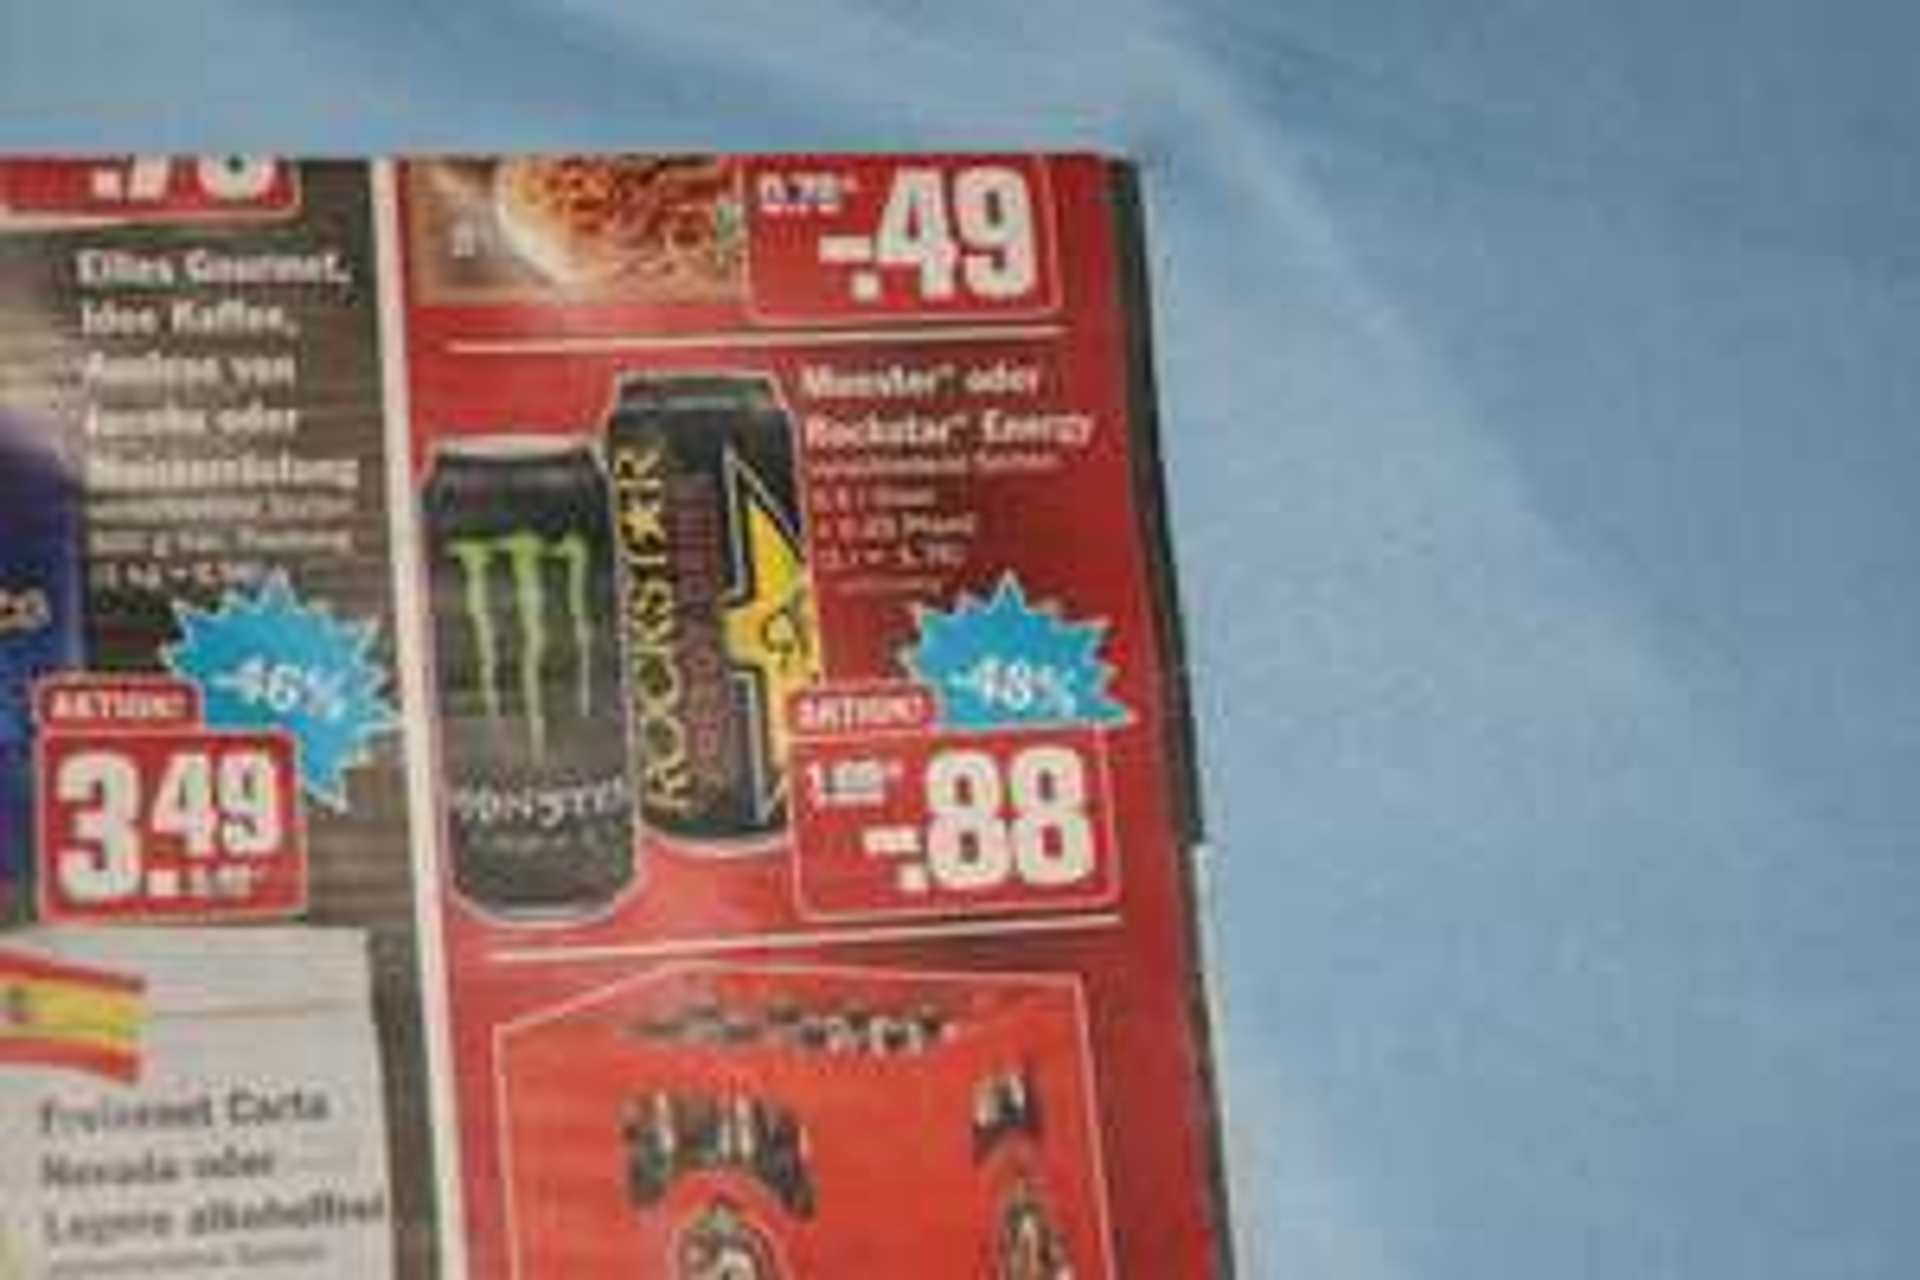 Monster Energy und Rockstar Energy für 88 Cent je 0,5 L-Dose (lokal Berlin HIT ULLRICH)